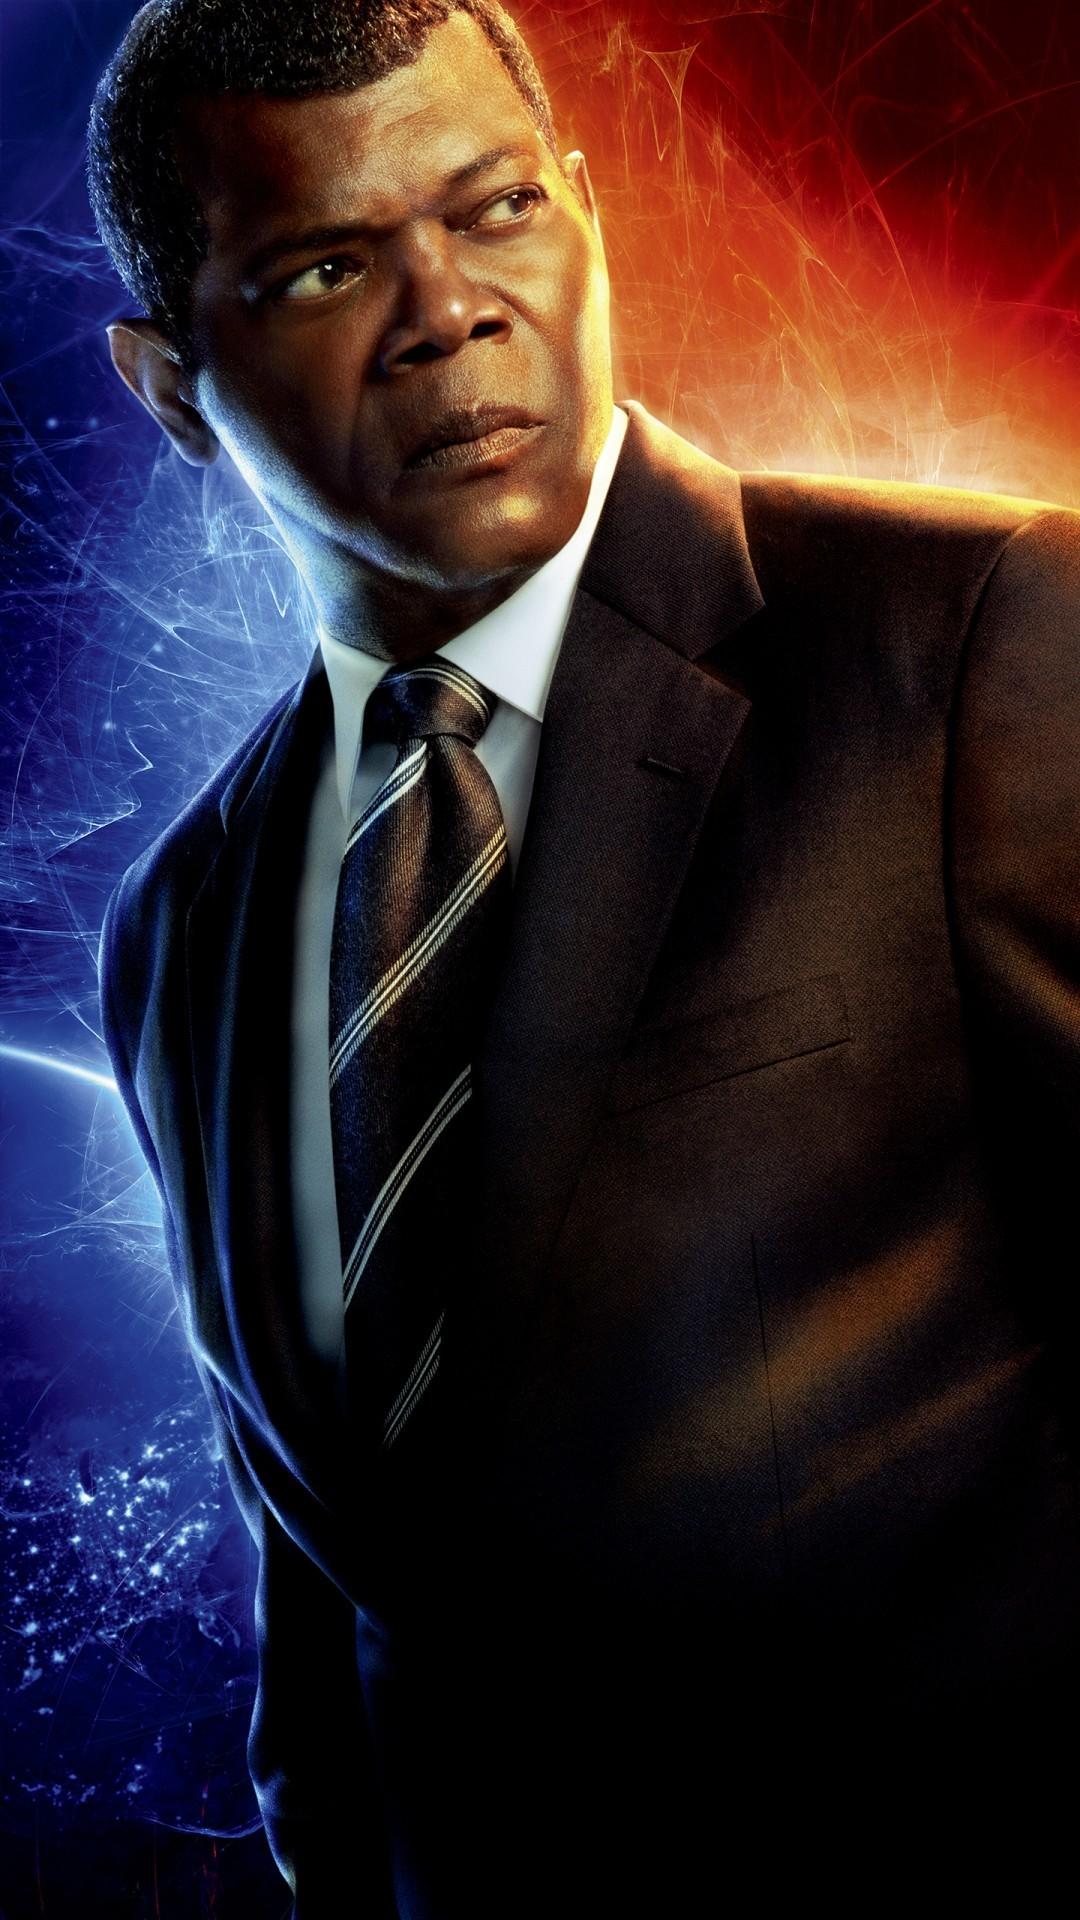 Free Samuel Jackson as Nick Fury in Captain Marvel phone wallpaper by angel03050822